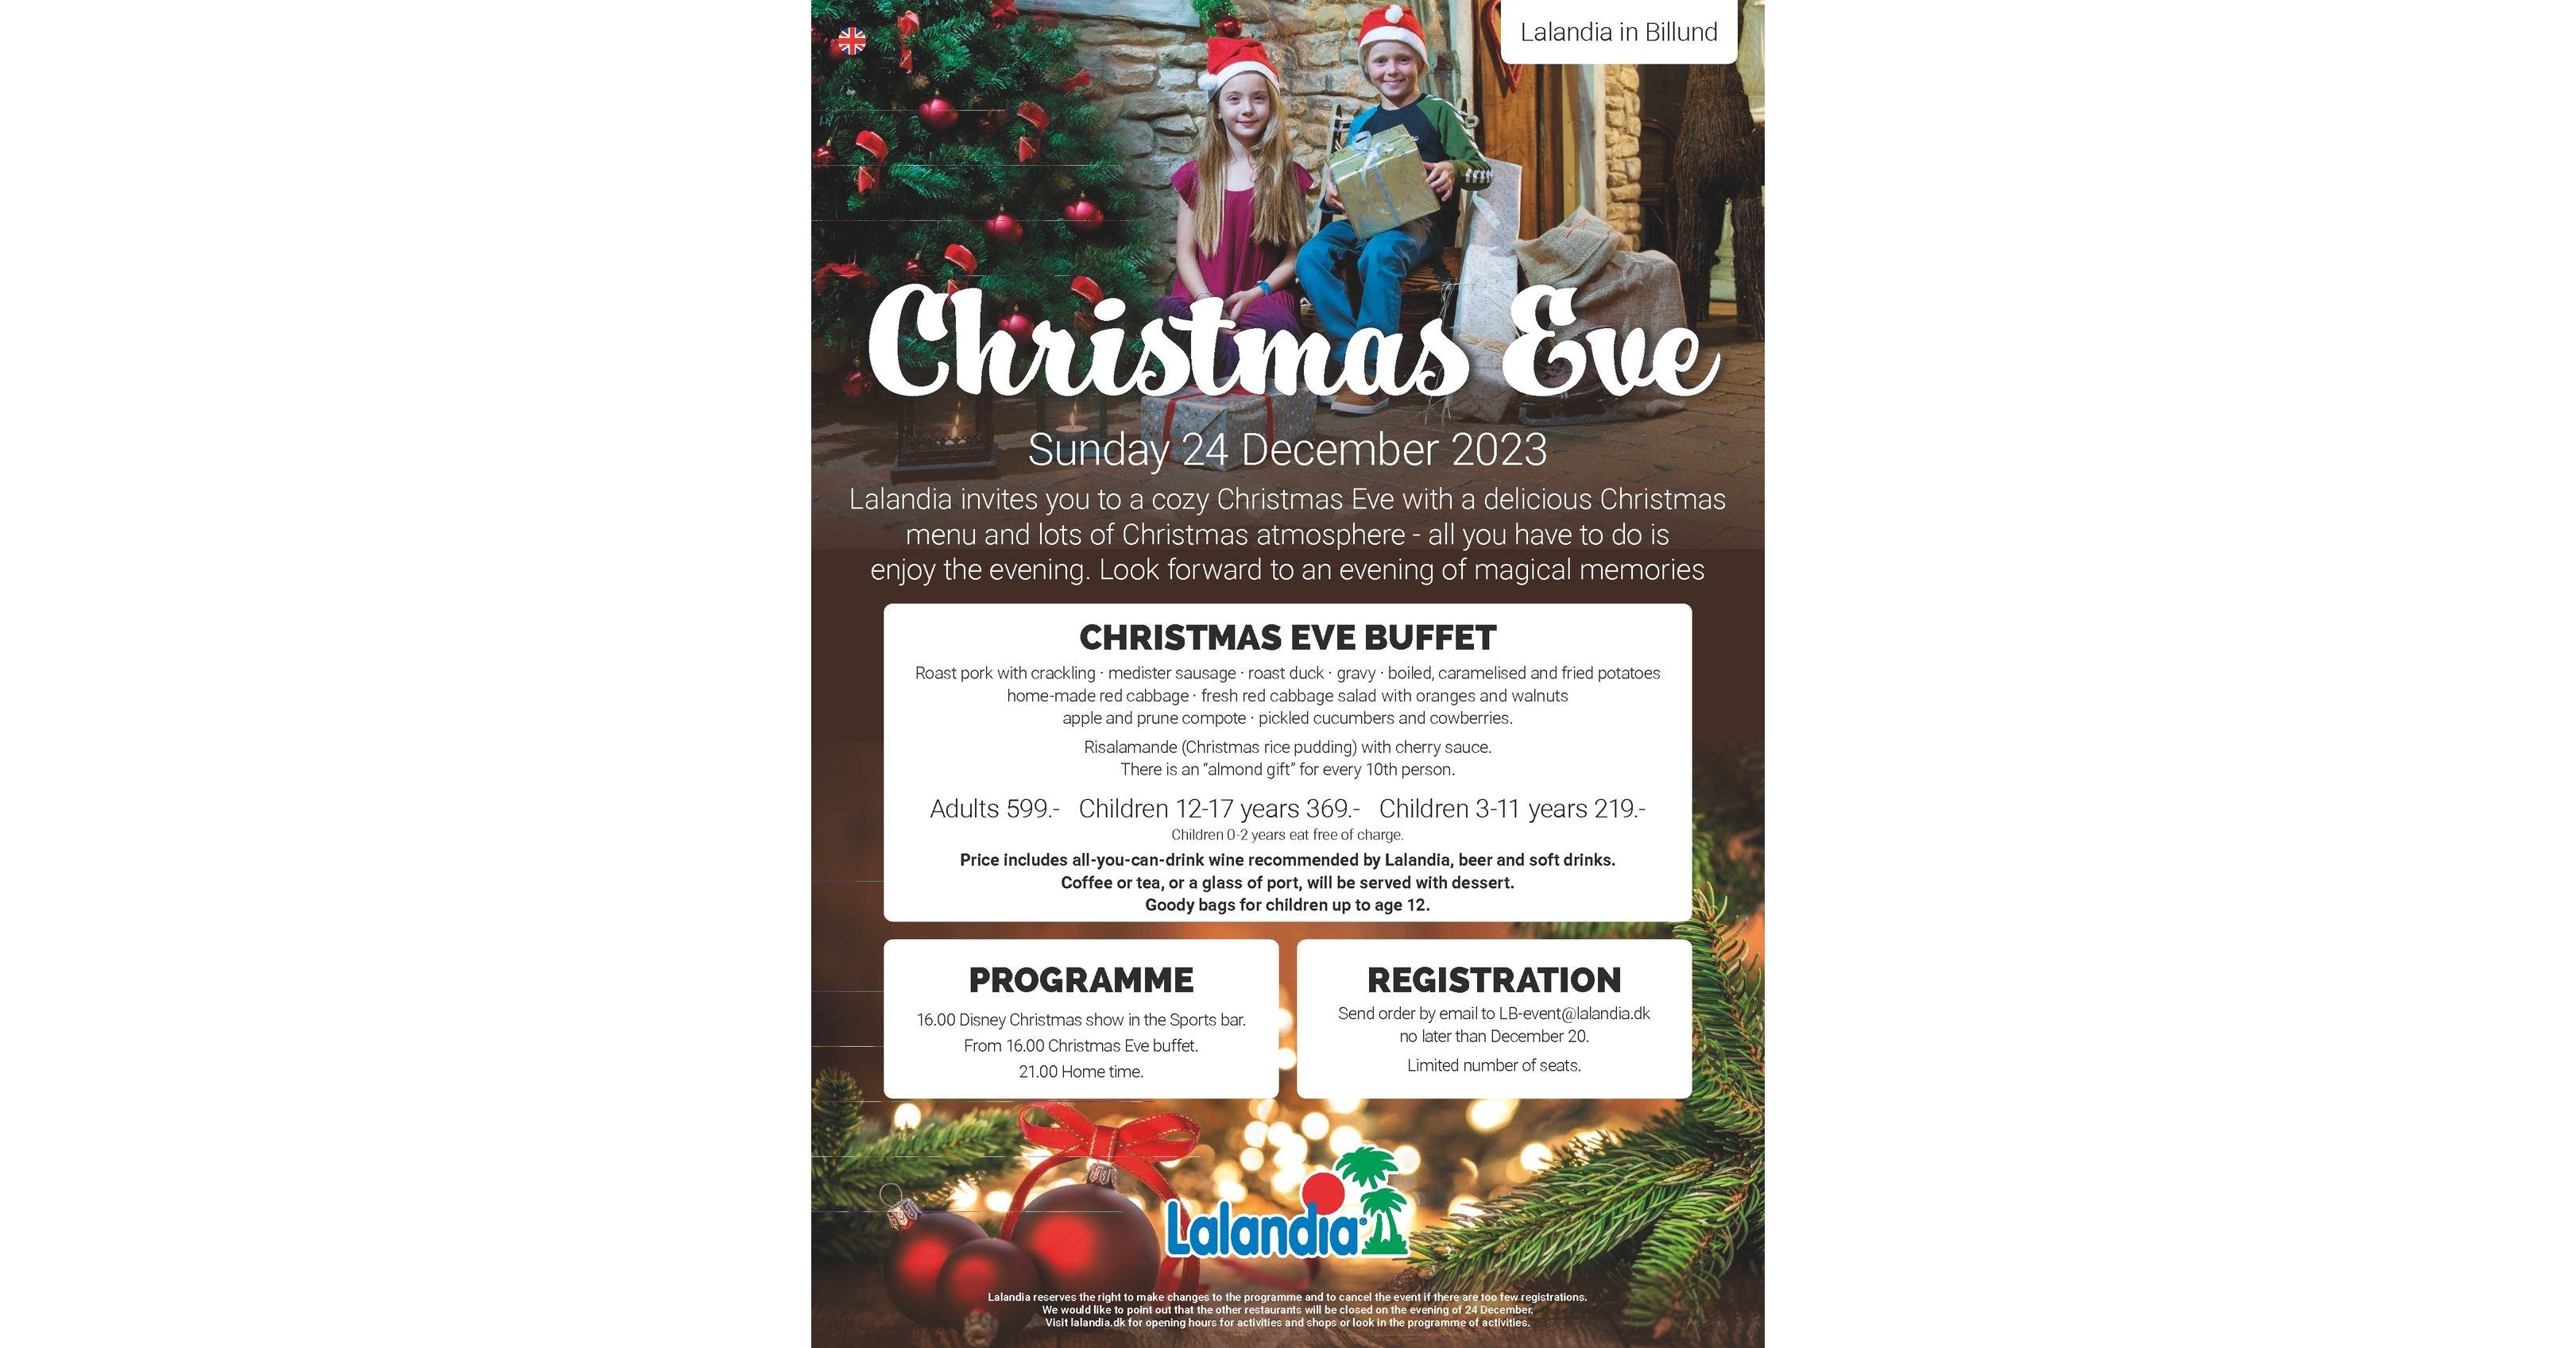 Restaurants Open On Christmas Eve 2019.Christmas Eve At Lalandia In Billund 2019